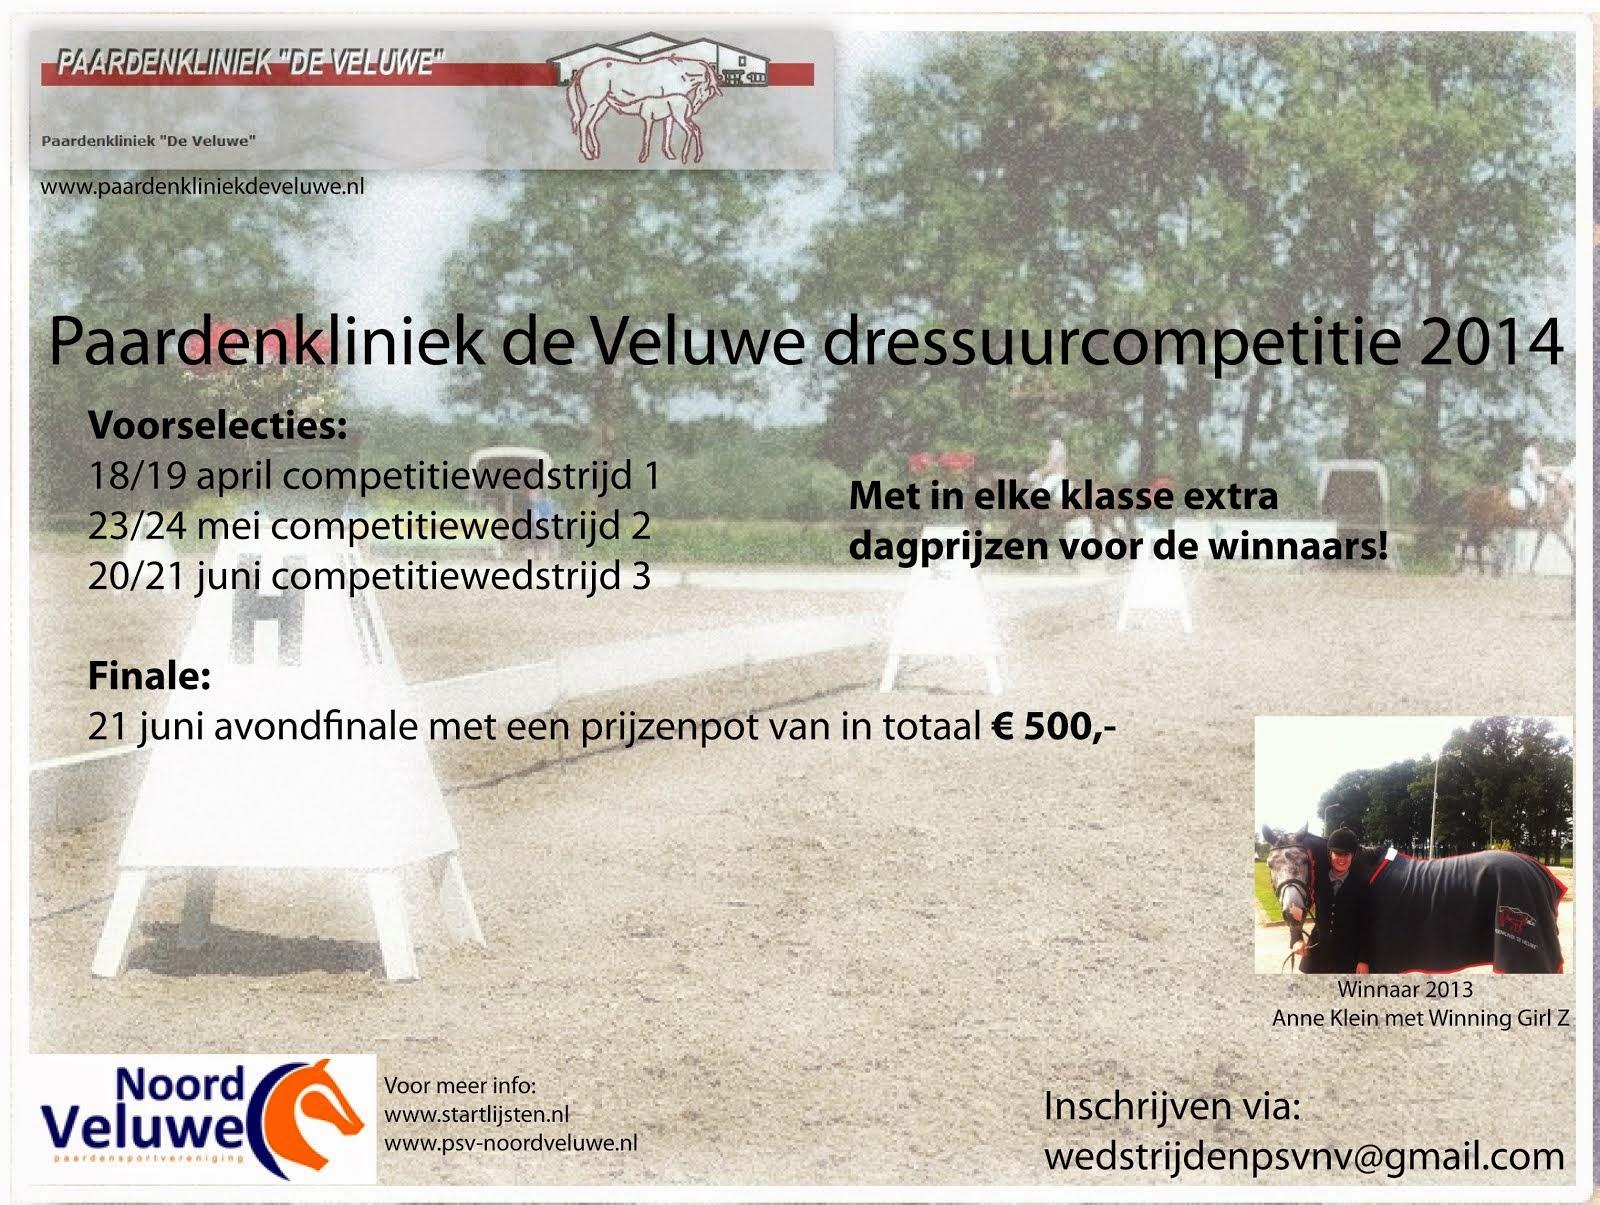 Dressuurcompetitie 2014 PSV Noord Veluwe